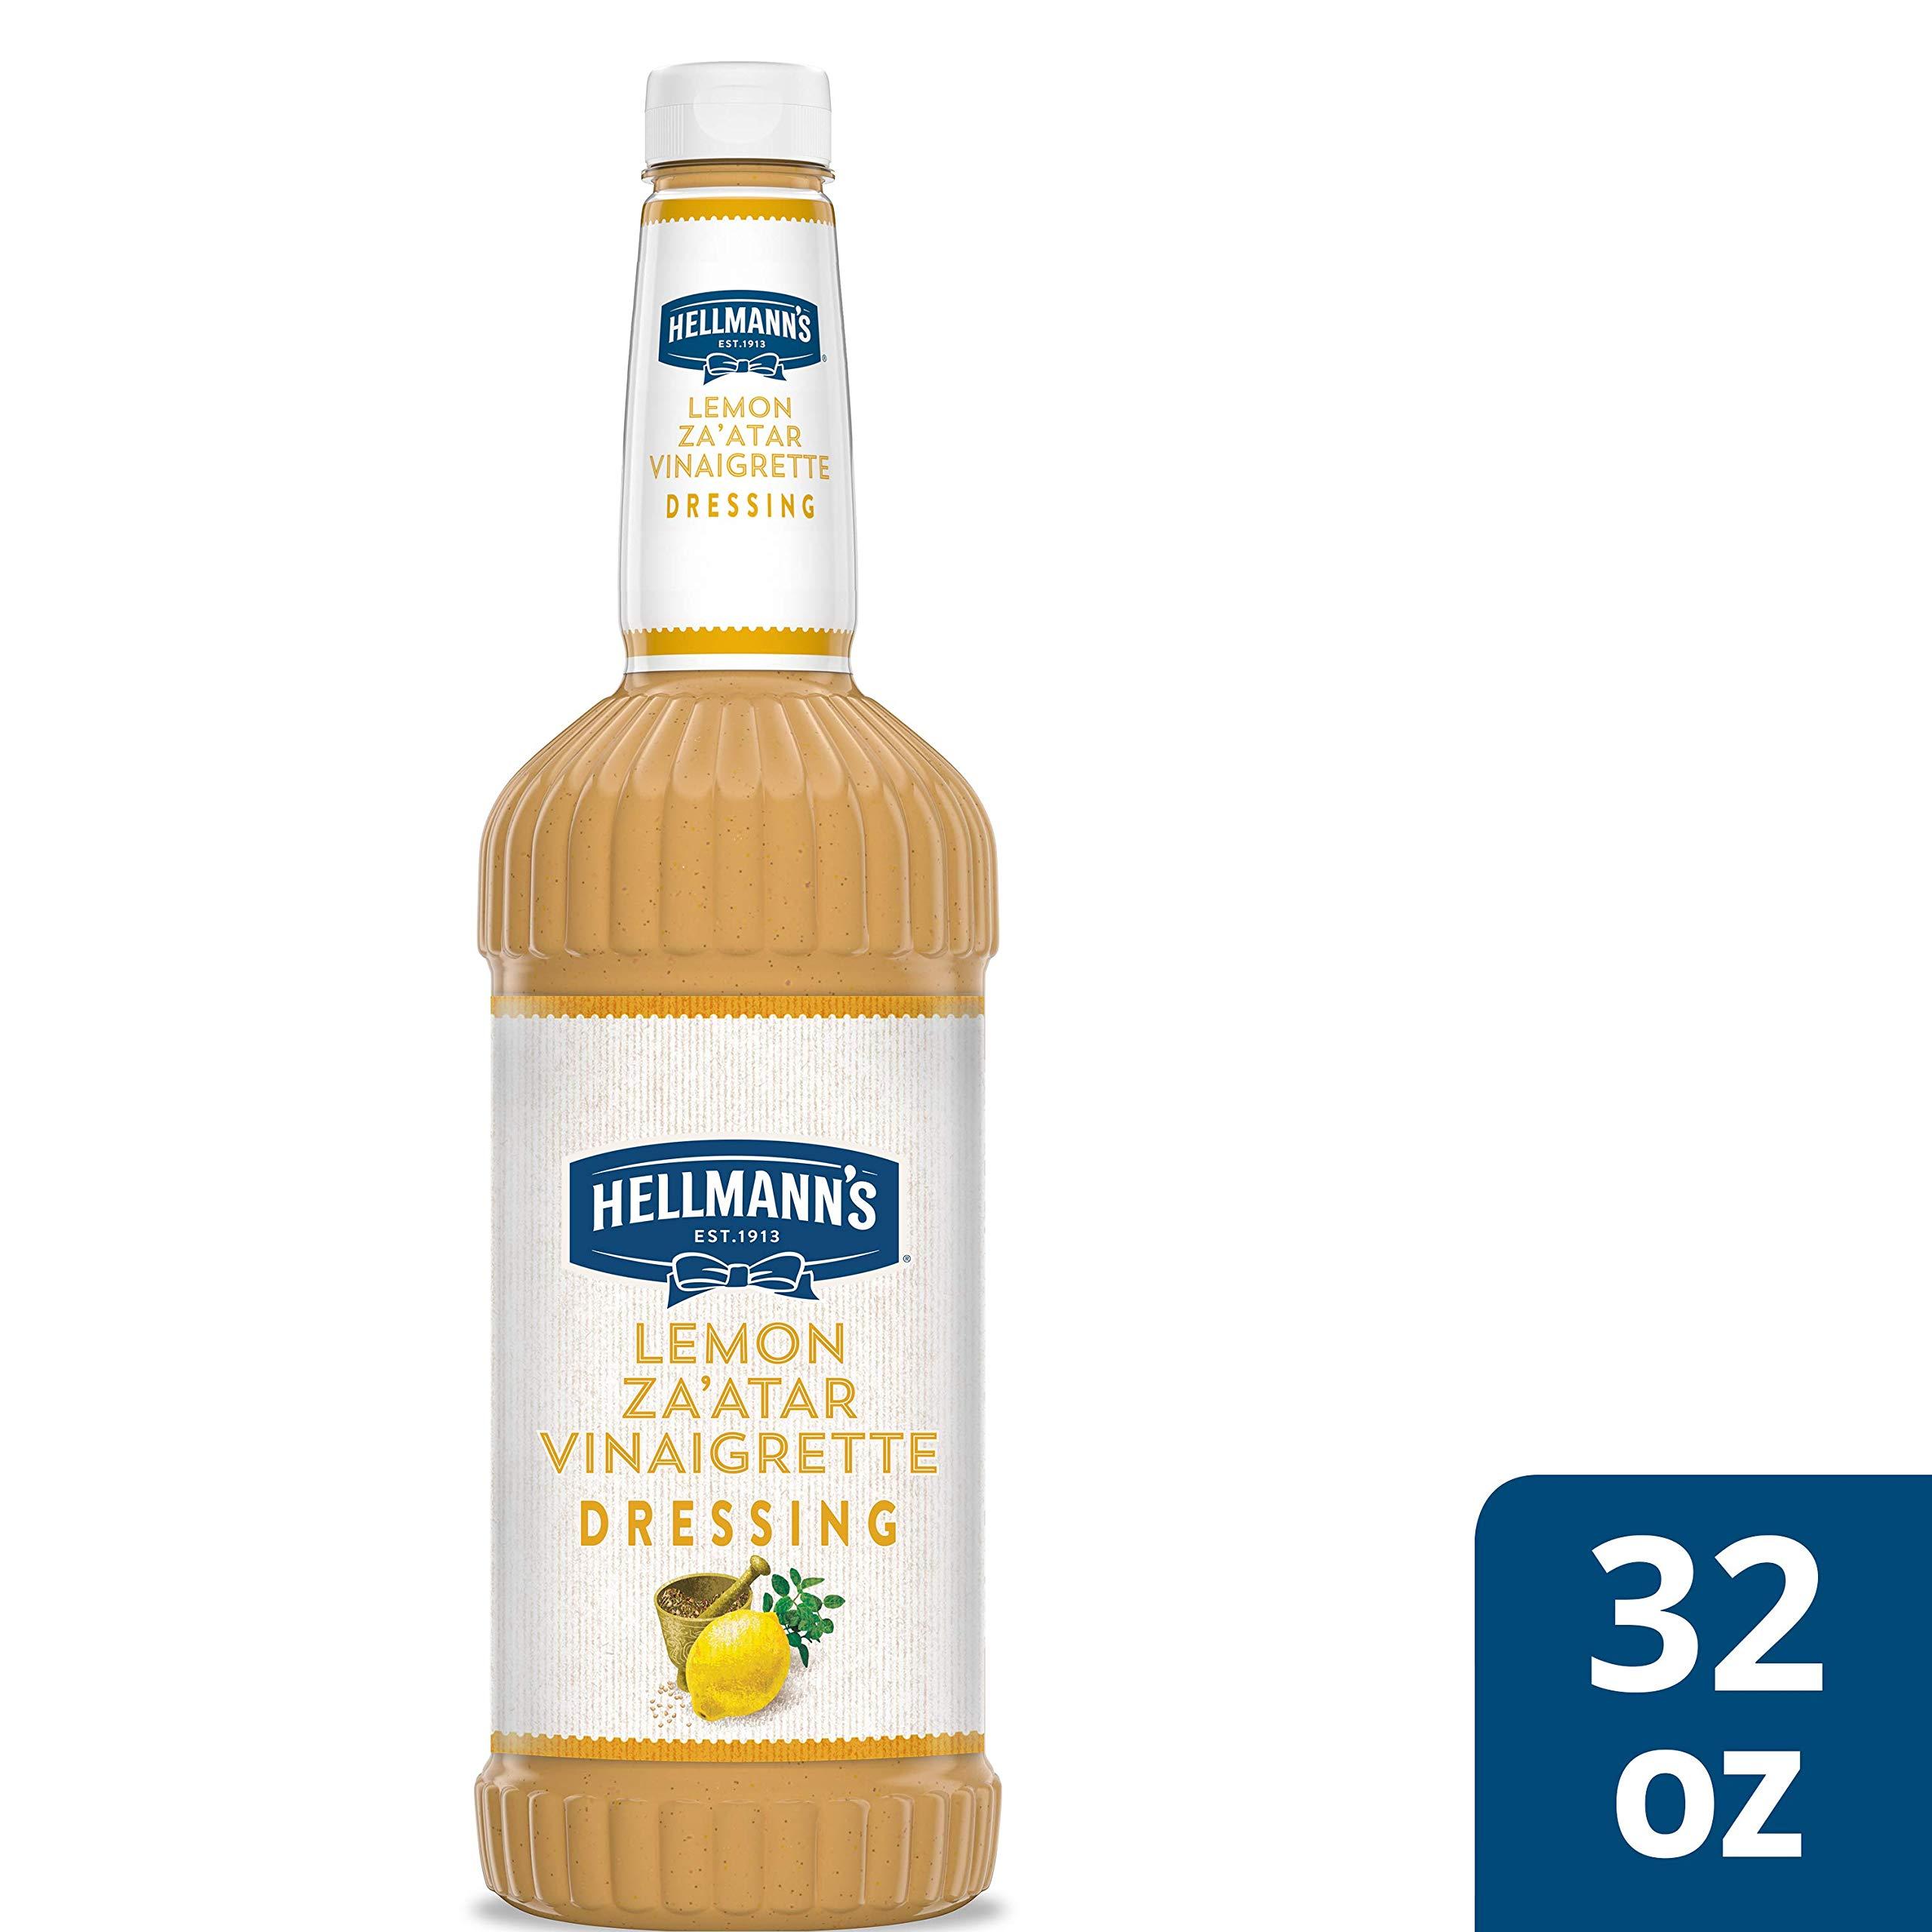 Hellmann's Lemon Za'atar Vinaigrette Salad Dressing Salad Bar BottlesGluten Free, No Artificial Flavors, Colors, added MSG or High Fructose Corn Syrup, 32 oz, Pack of 6 by Hellmann's